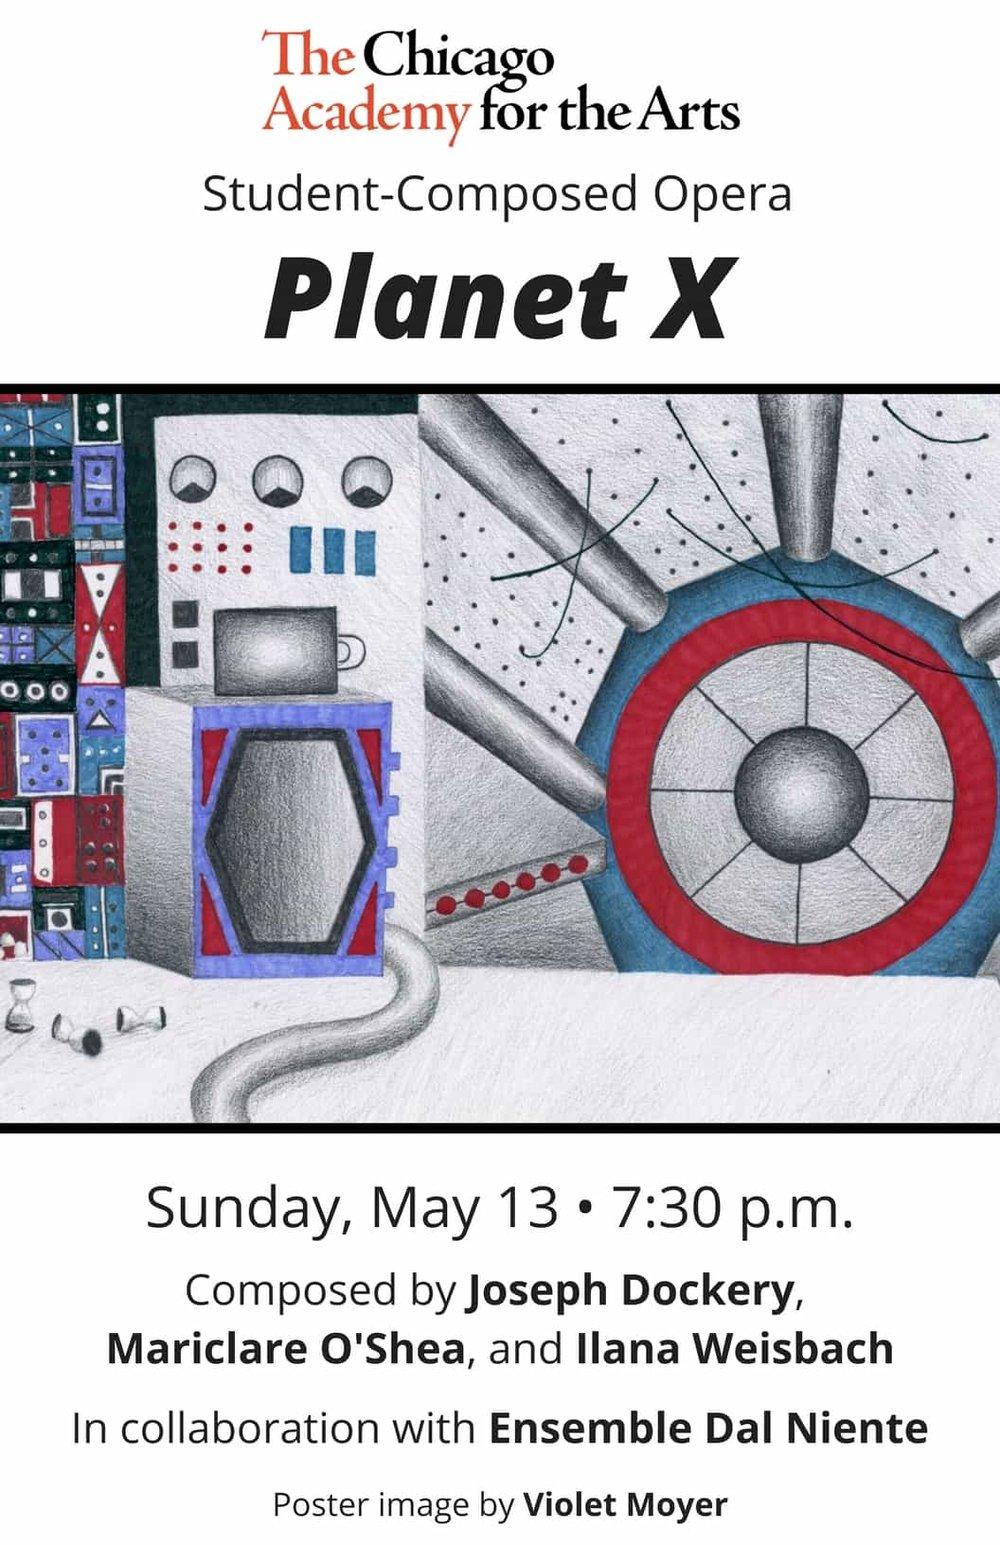 Opera 2018 Poster - Planet X.jpg